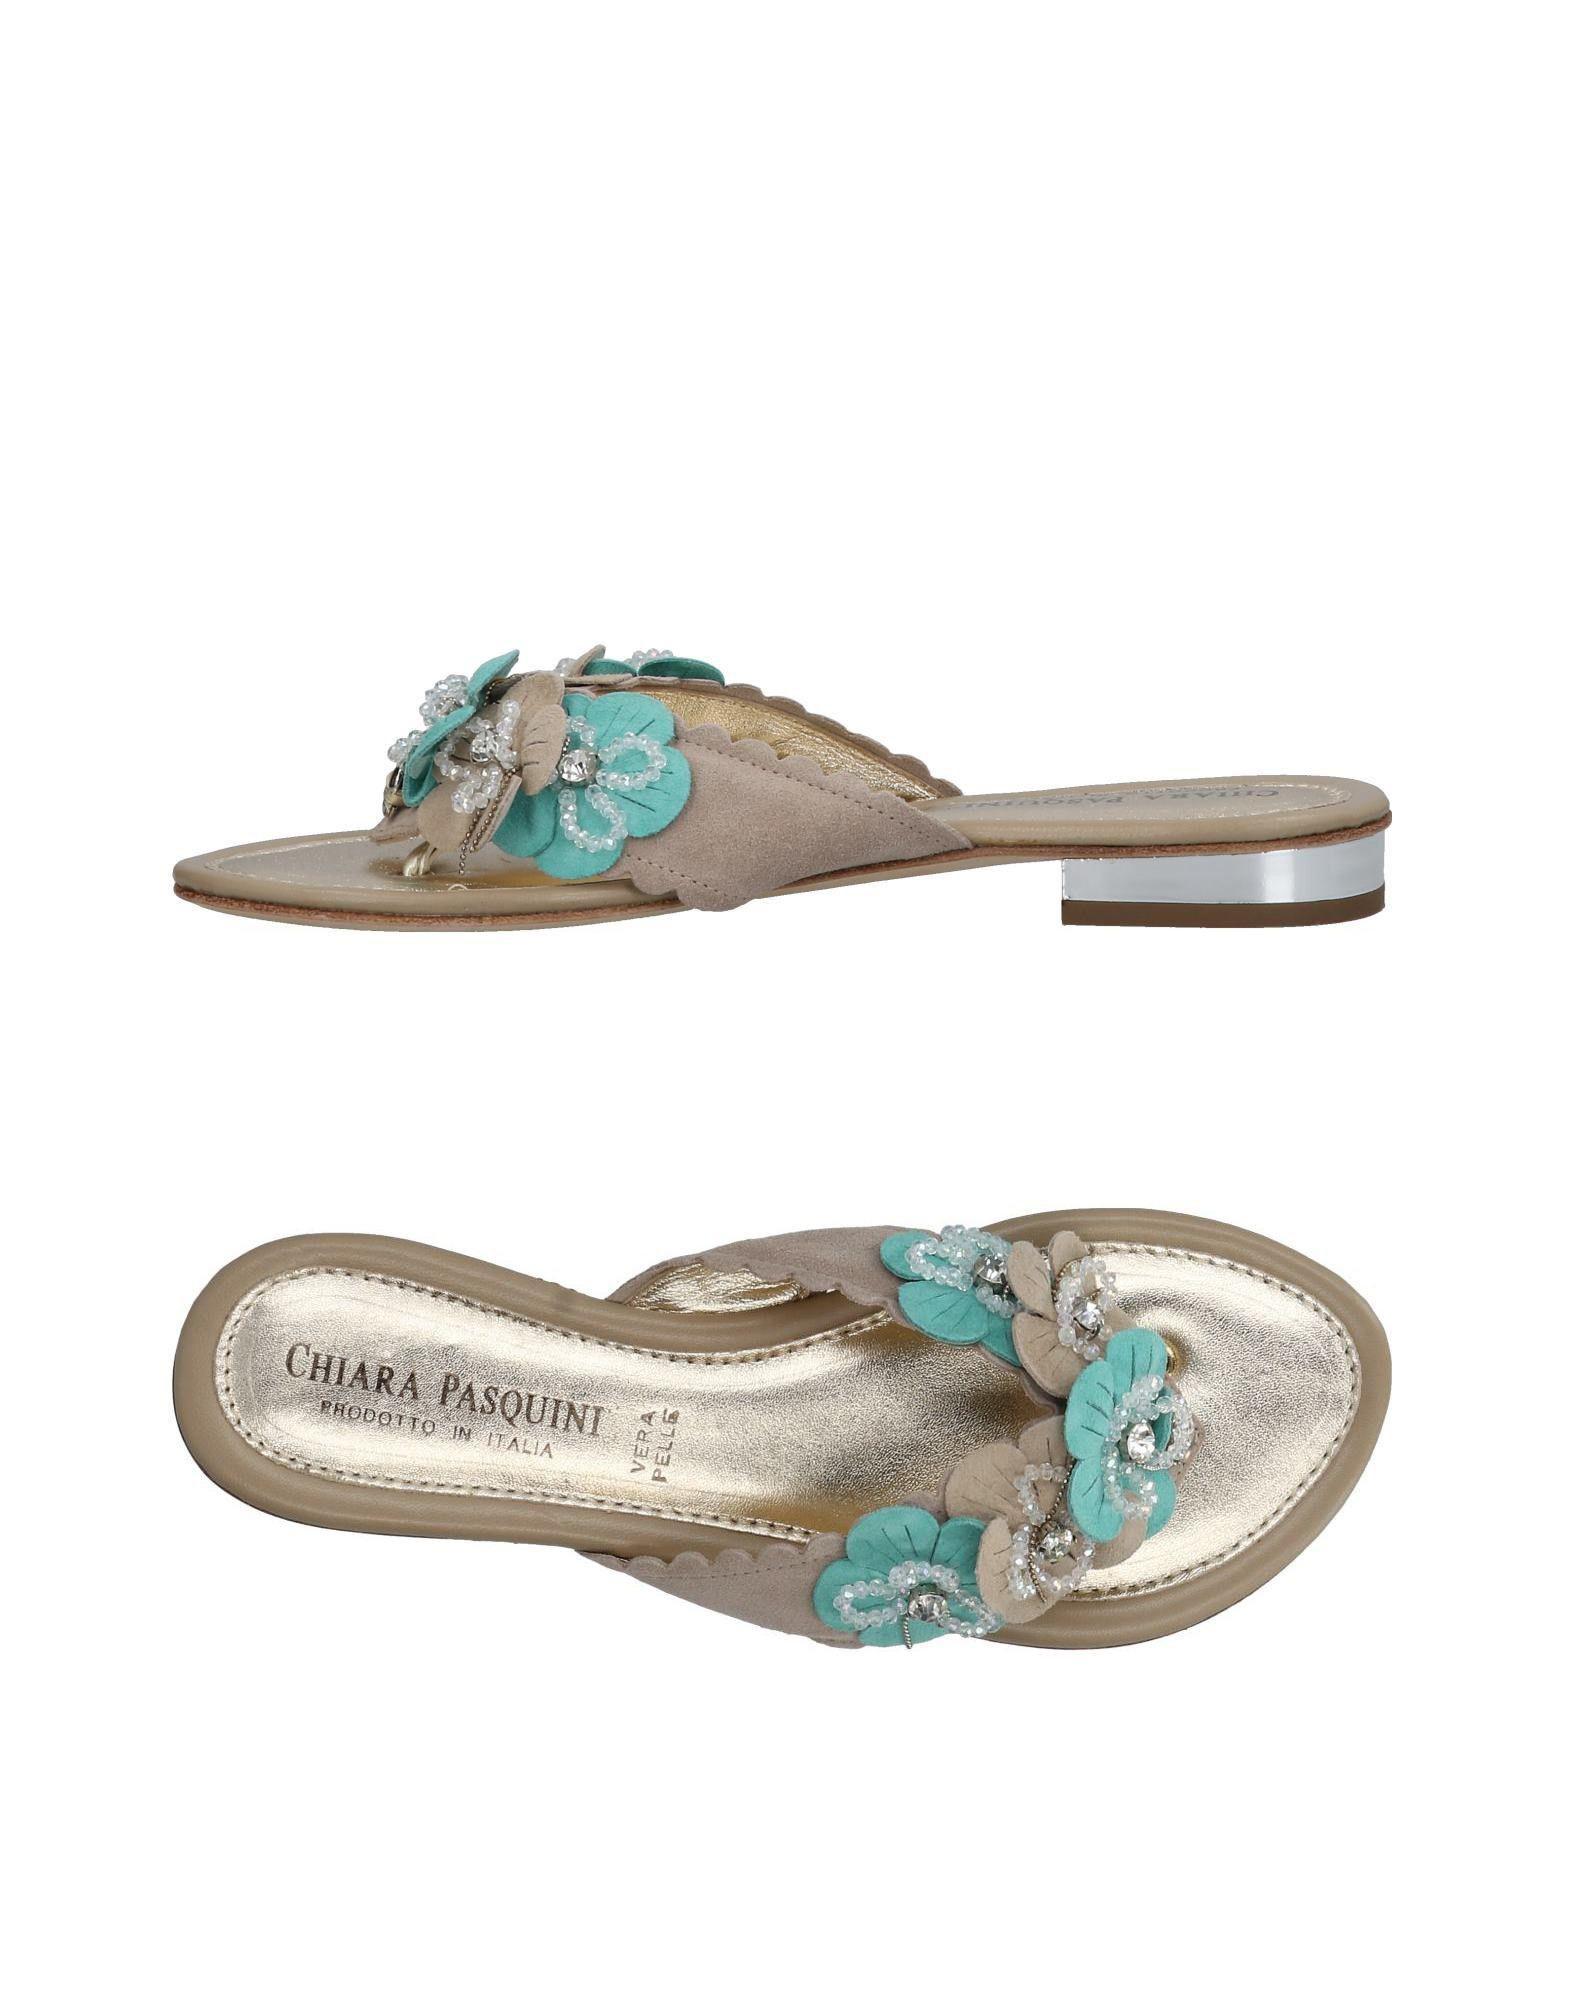 Sandale Entredoigt Pasquini Chiara mRmGZnO